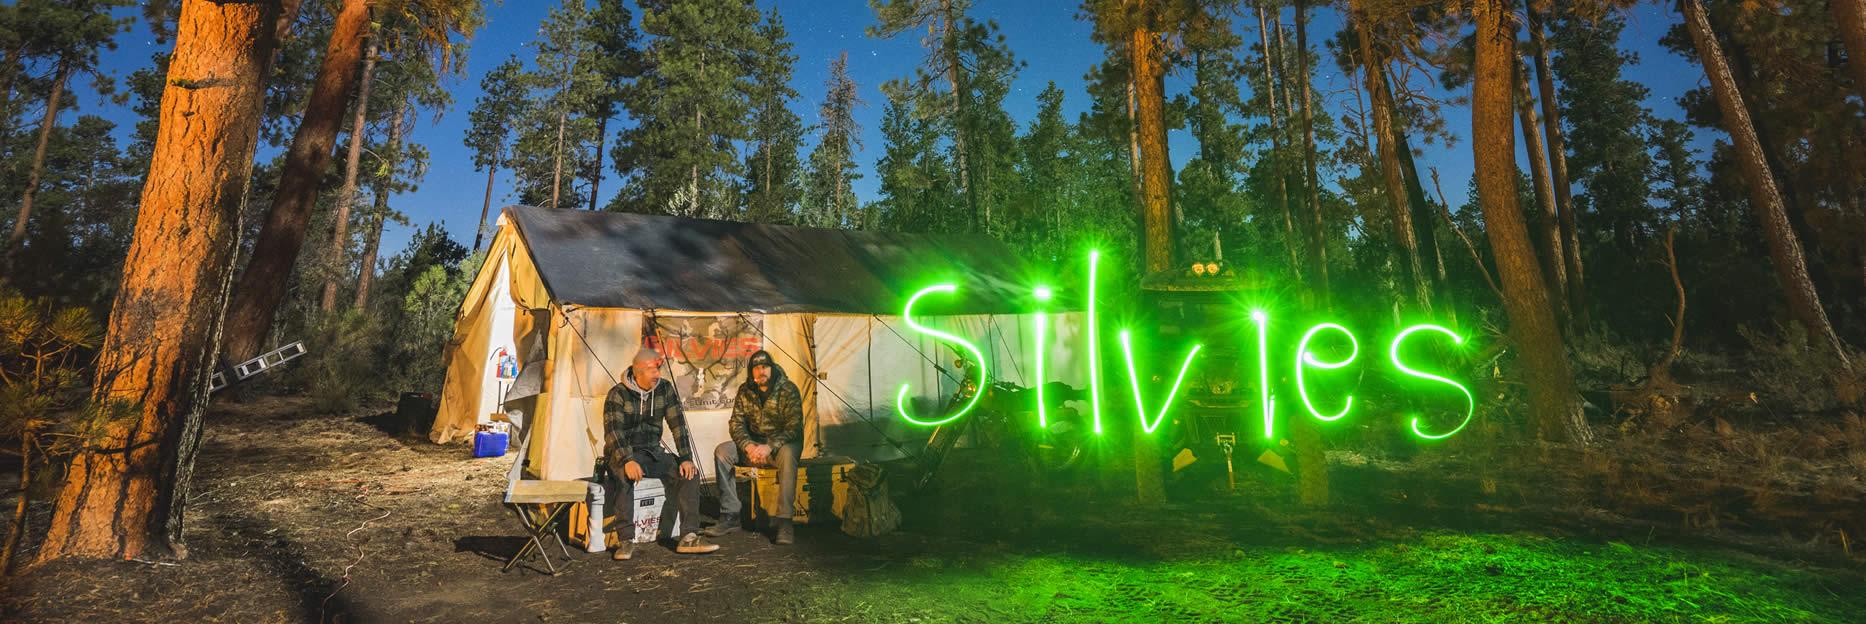 Silvies Unit Camp